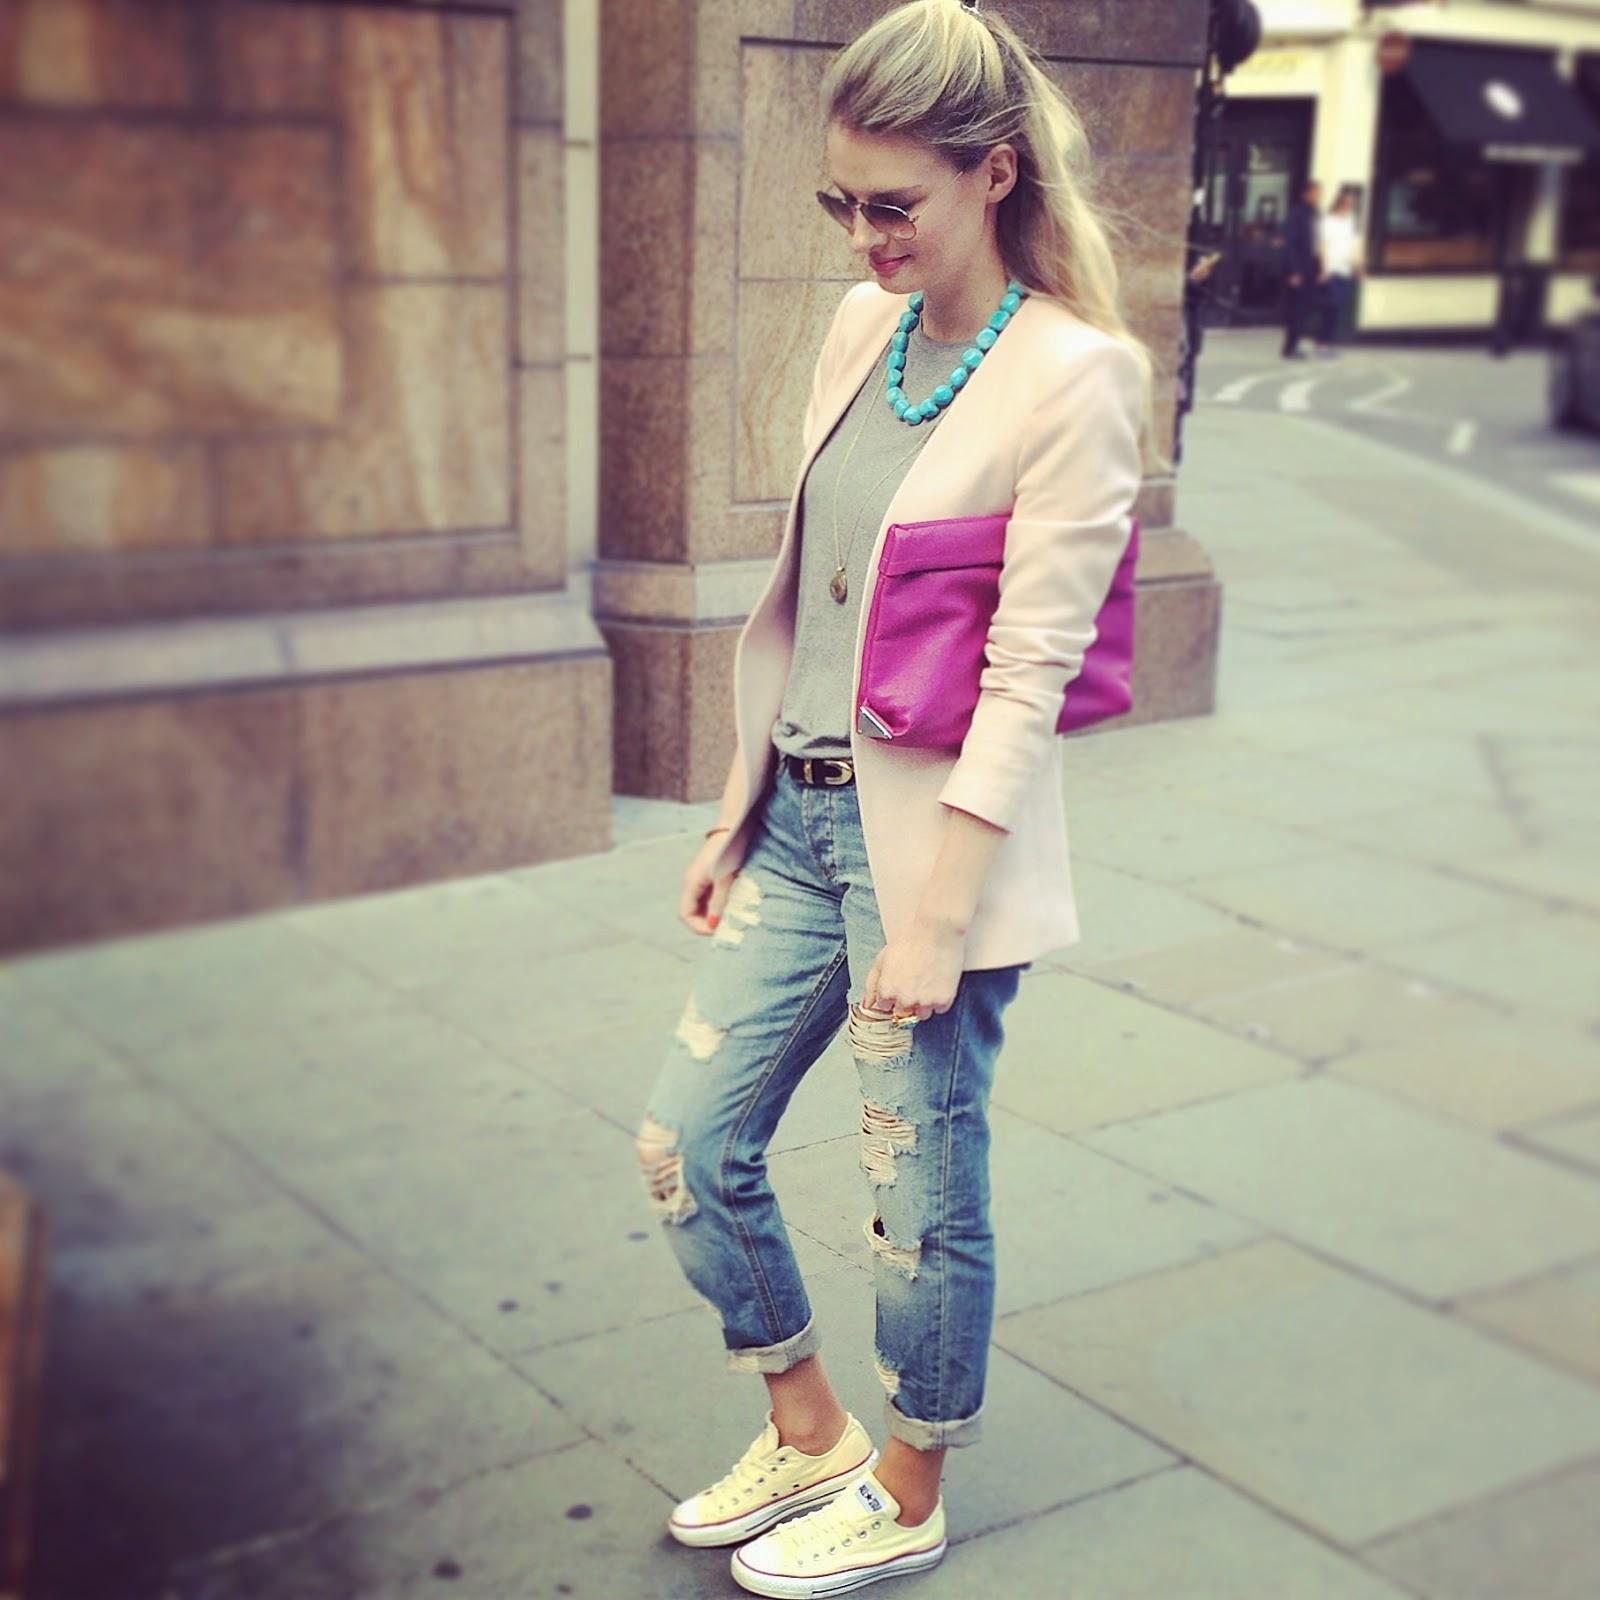 street style, asos jeans, asos denim, converse and boyfriend jeans, pink plazer, london street style, pastel blazer, ripped boyfriend jeans, asos ripped boyfriend jeans, pink clutch